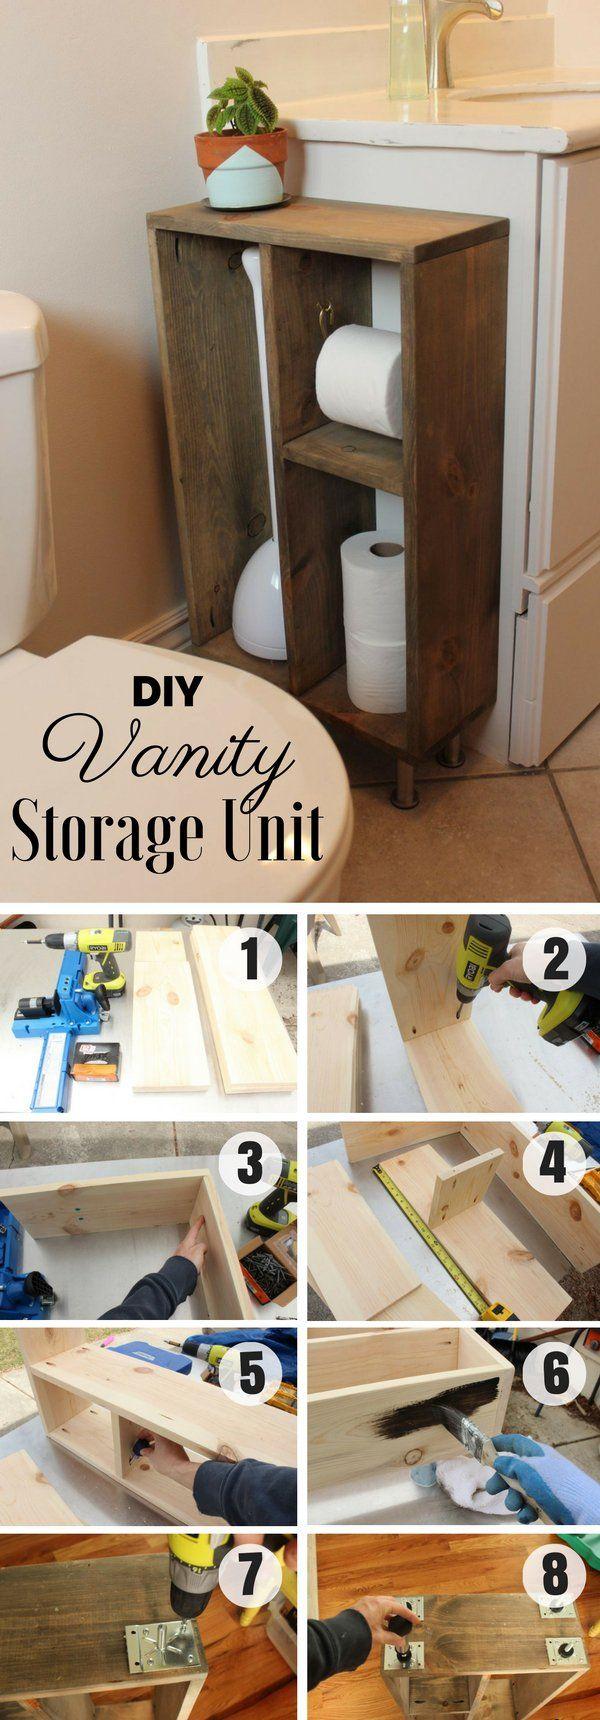 Easy to build DIY Vanity Storage Unit for rustic bathroom decor @istandarddesign